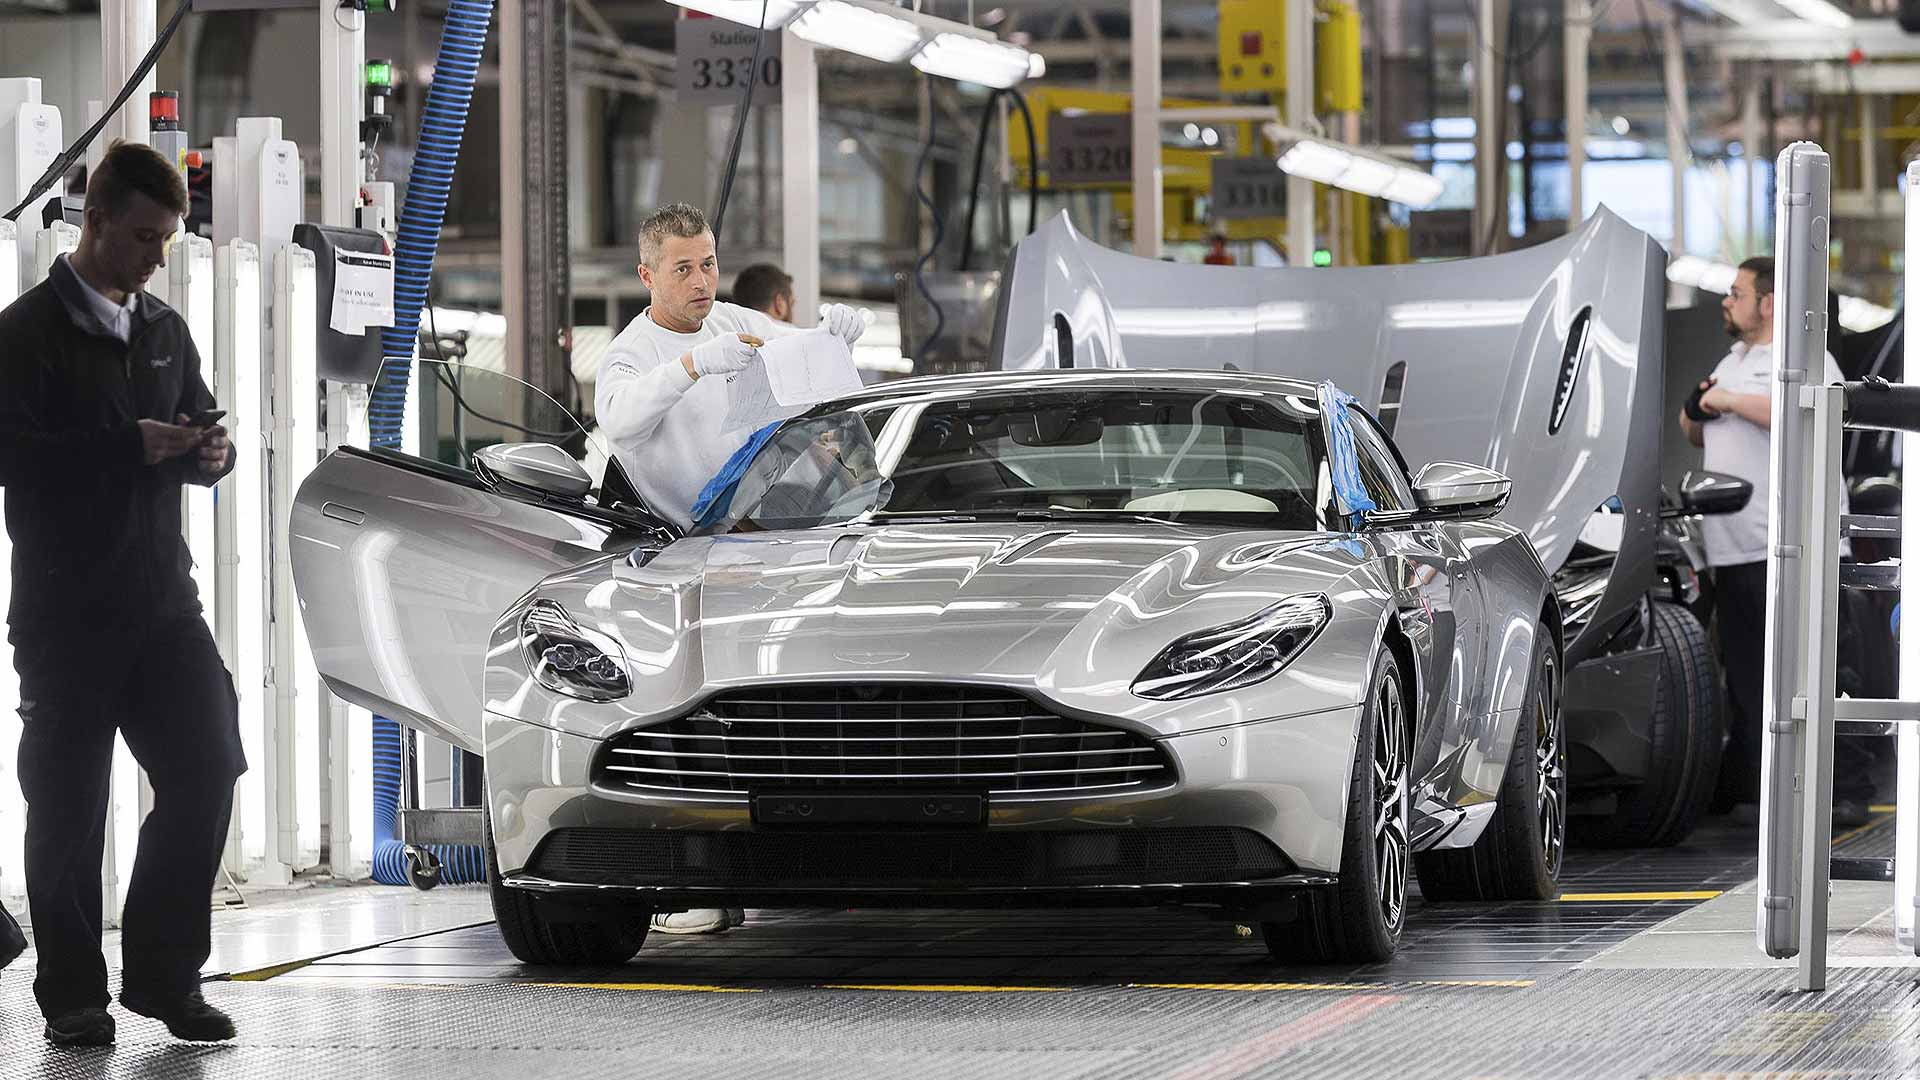 Aston Martin supercar production in Gaydon